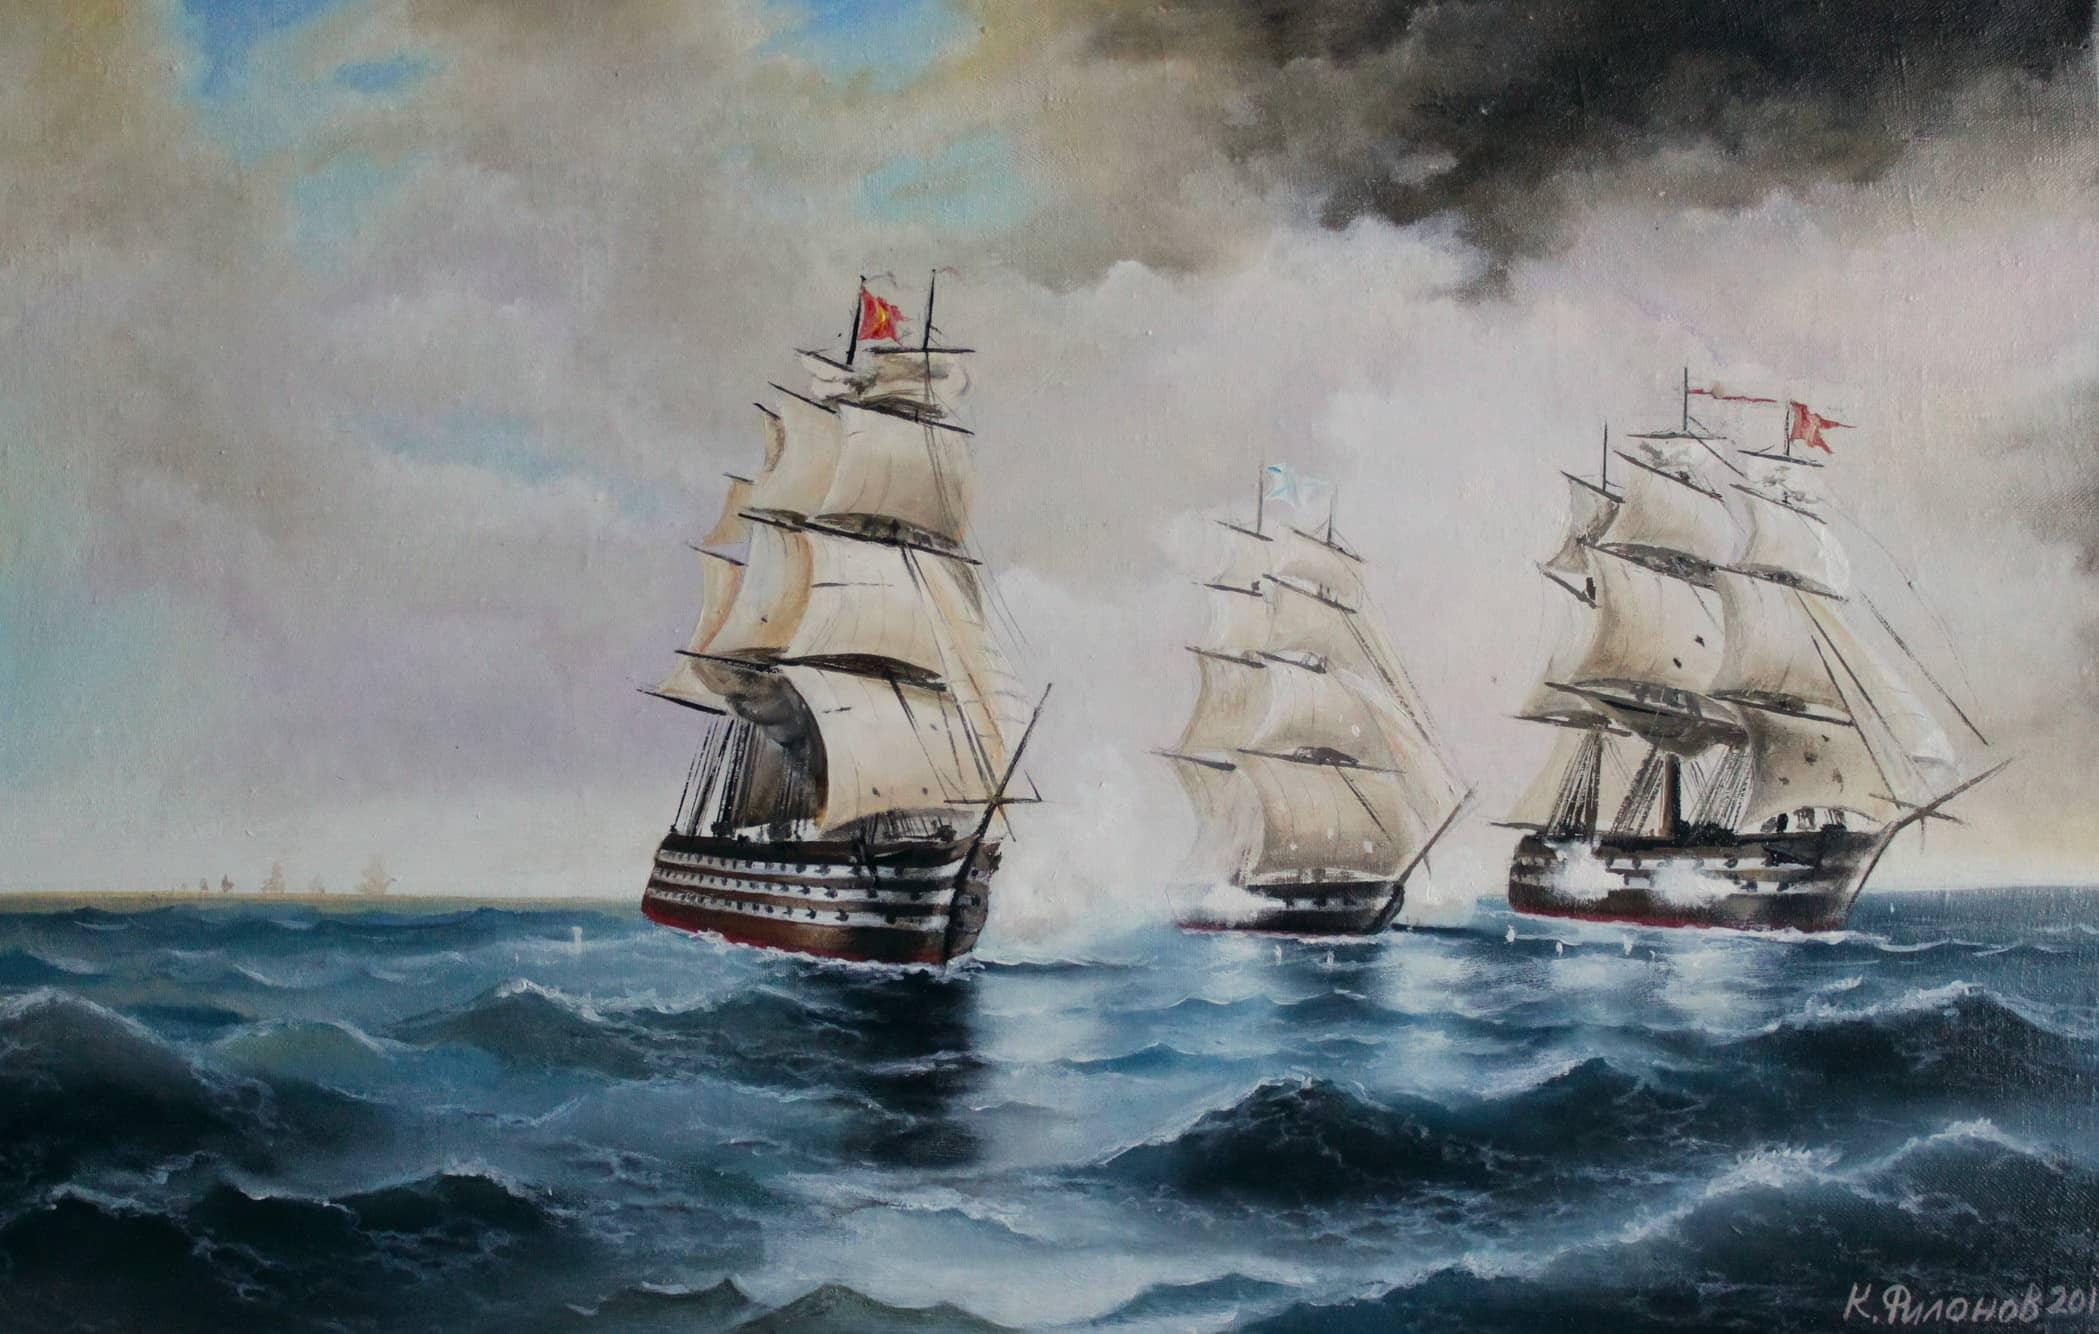 Бриг Меркурий атакованный 2 турецкими кораблями